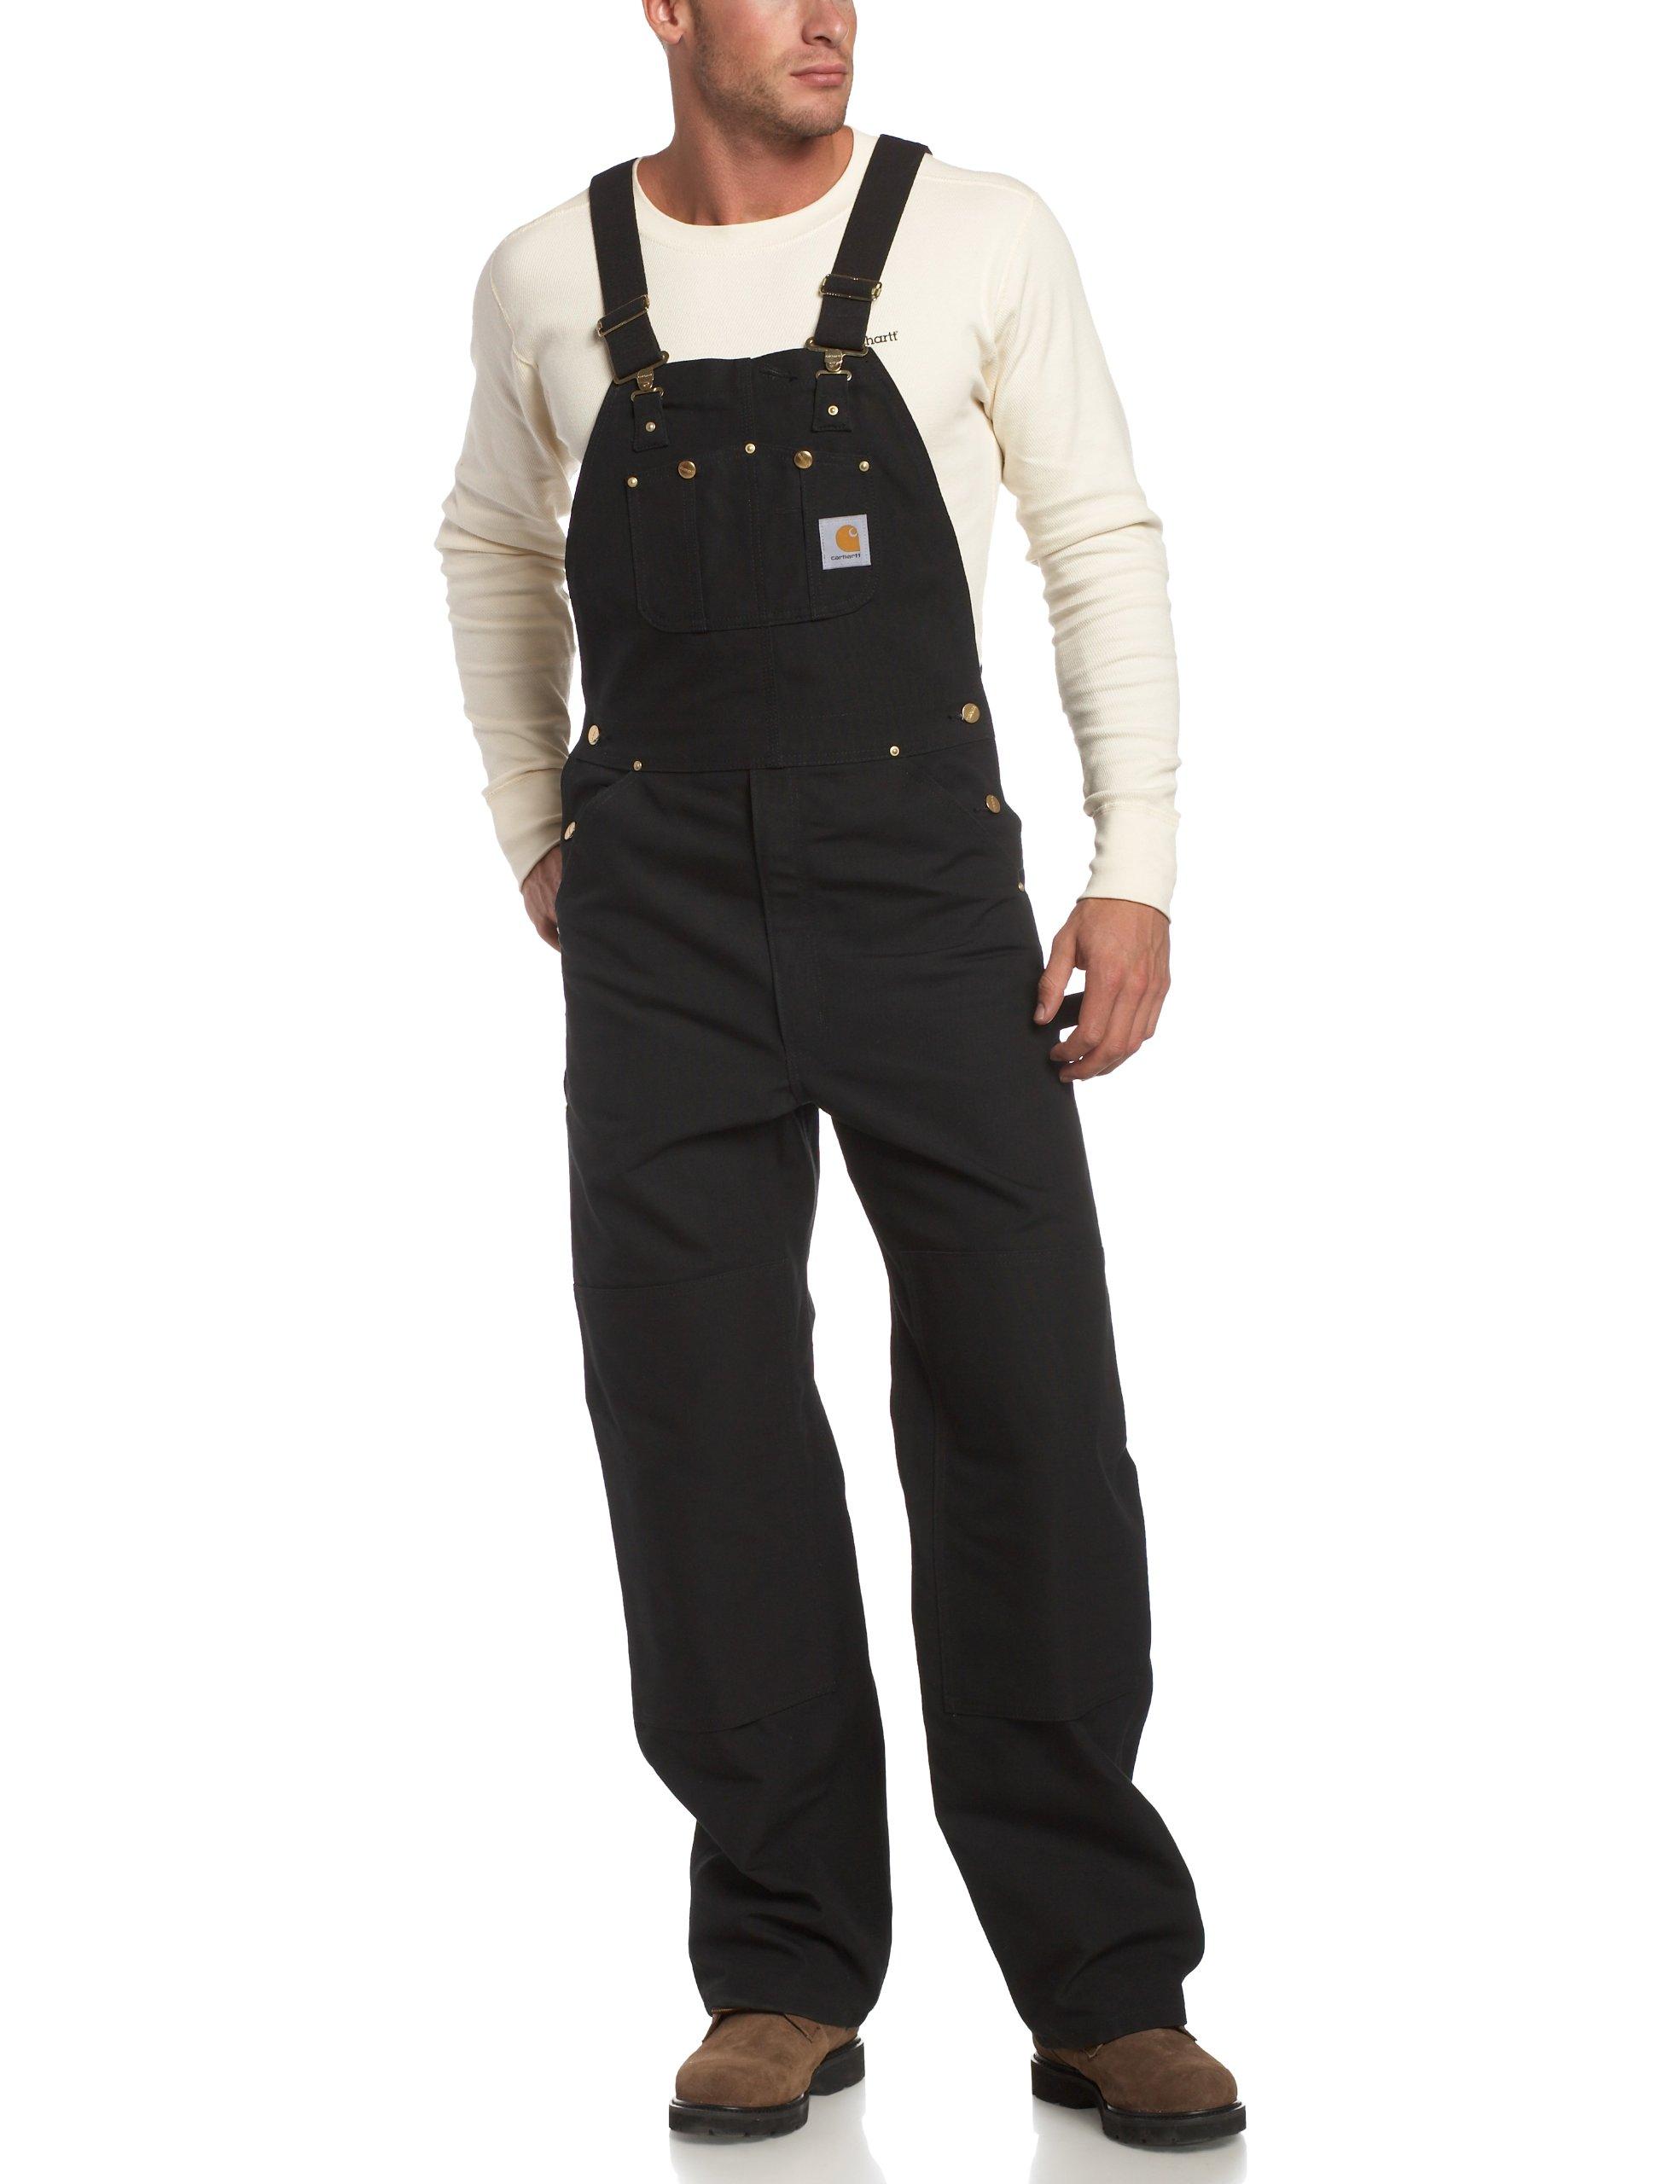 Carhartt Men's Duck Bib Overall Unlined R01,Black,42 x 28